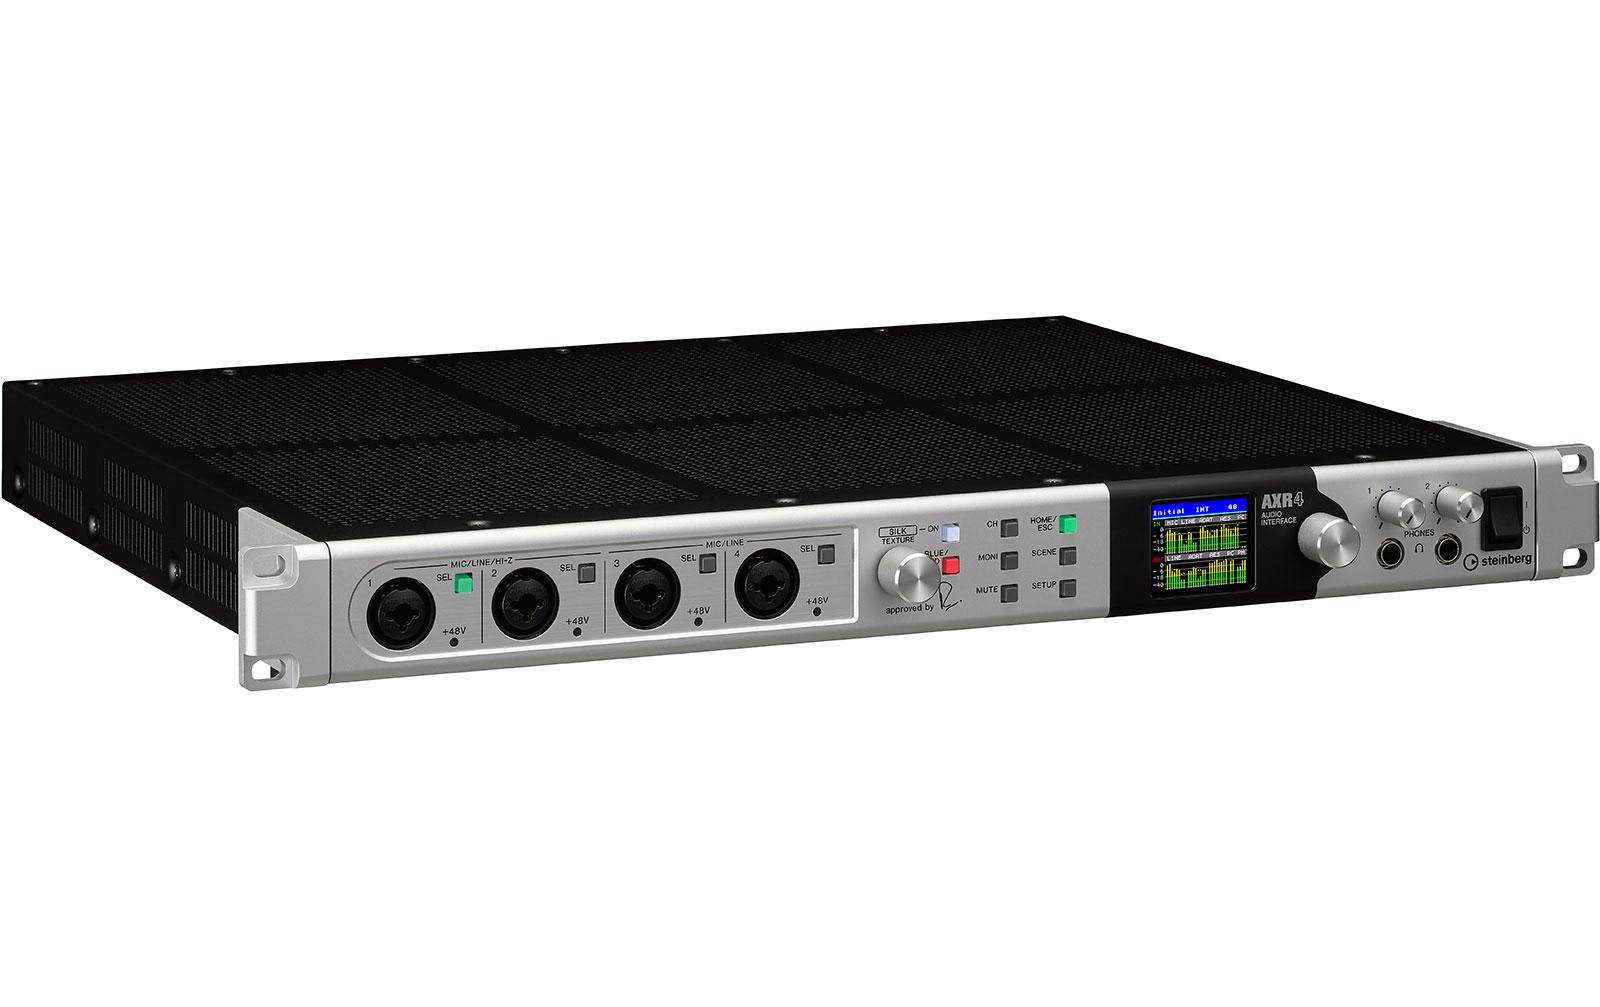 steinberg-axr4-thunderbolt-2-audio-interface